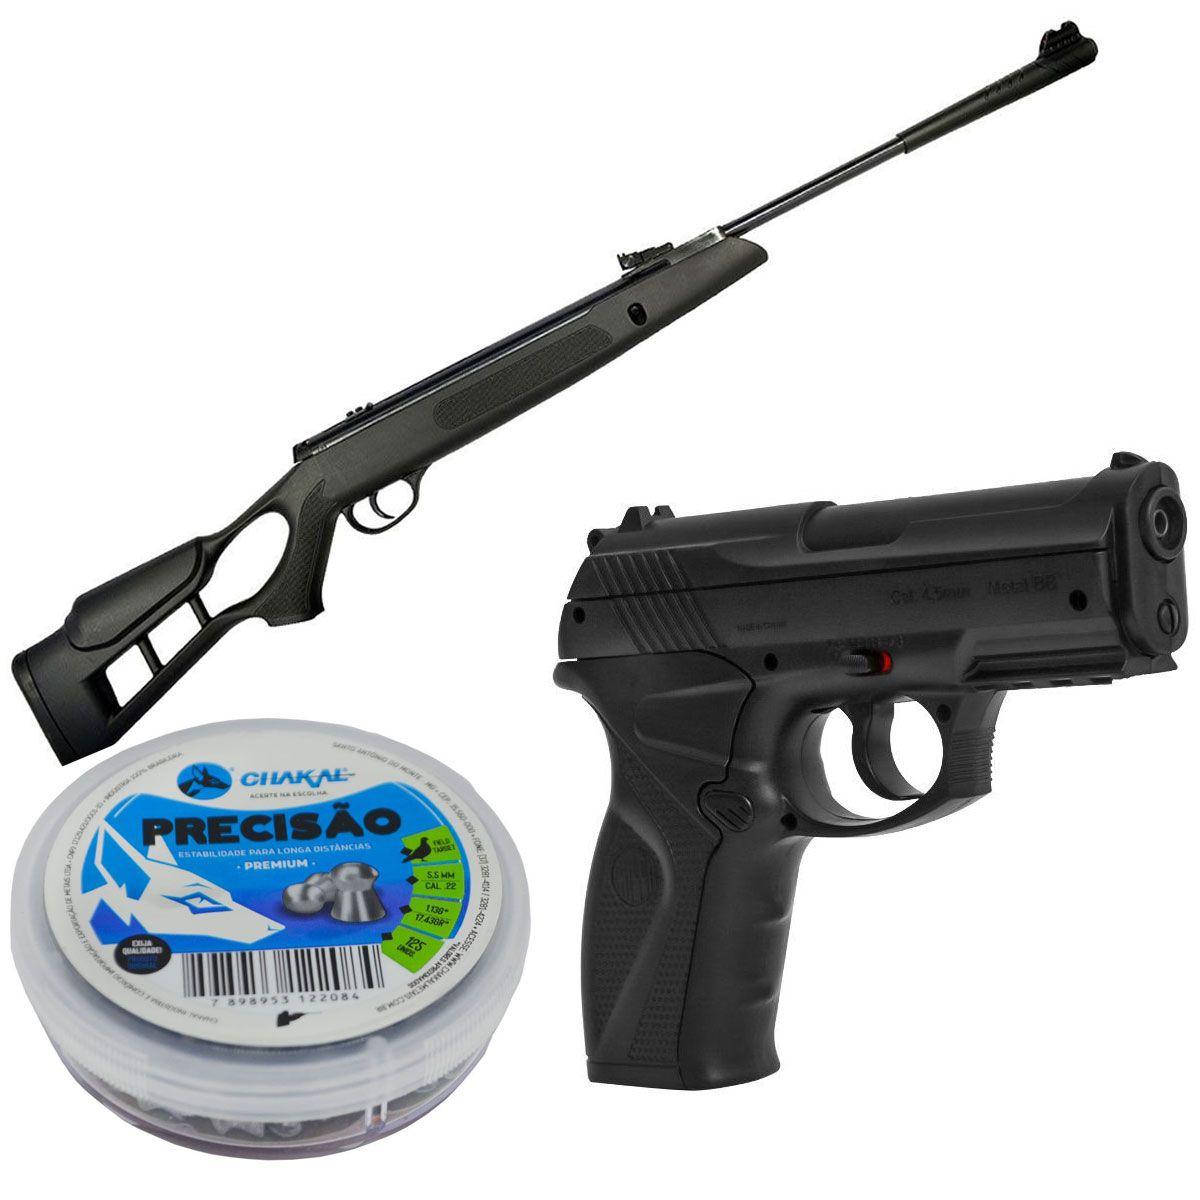 Kit Carabina 5,5mm + Chumbinho 5,5mm + Pistola C11 4,5mm